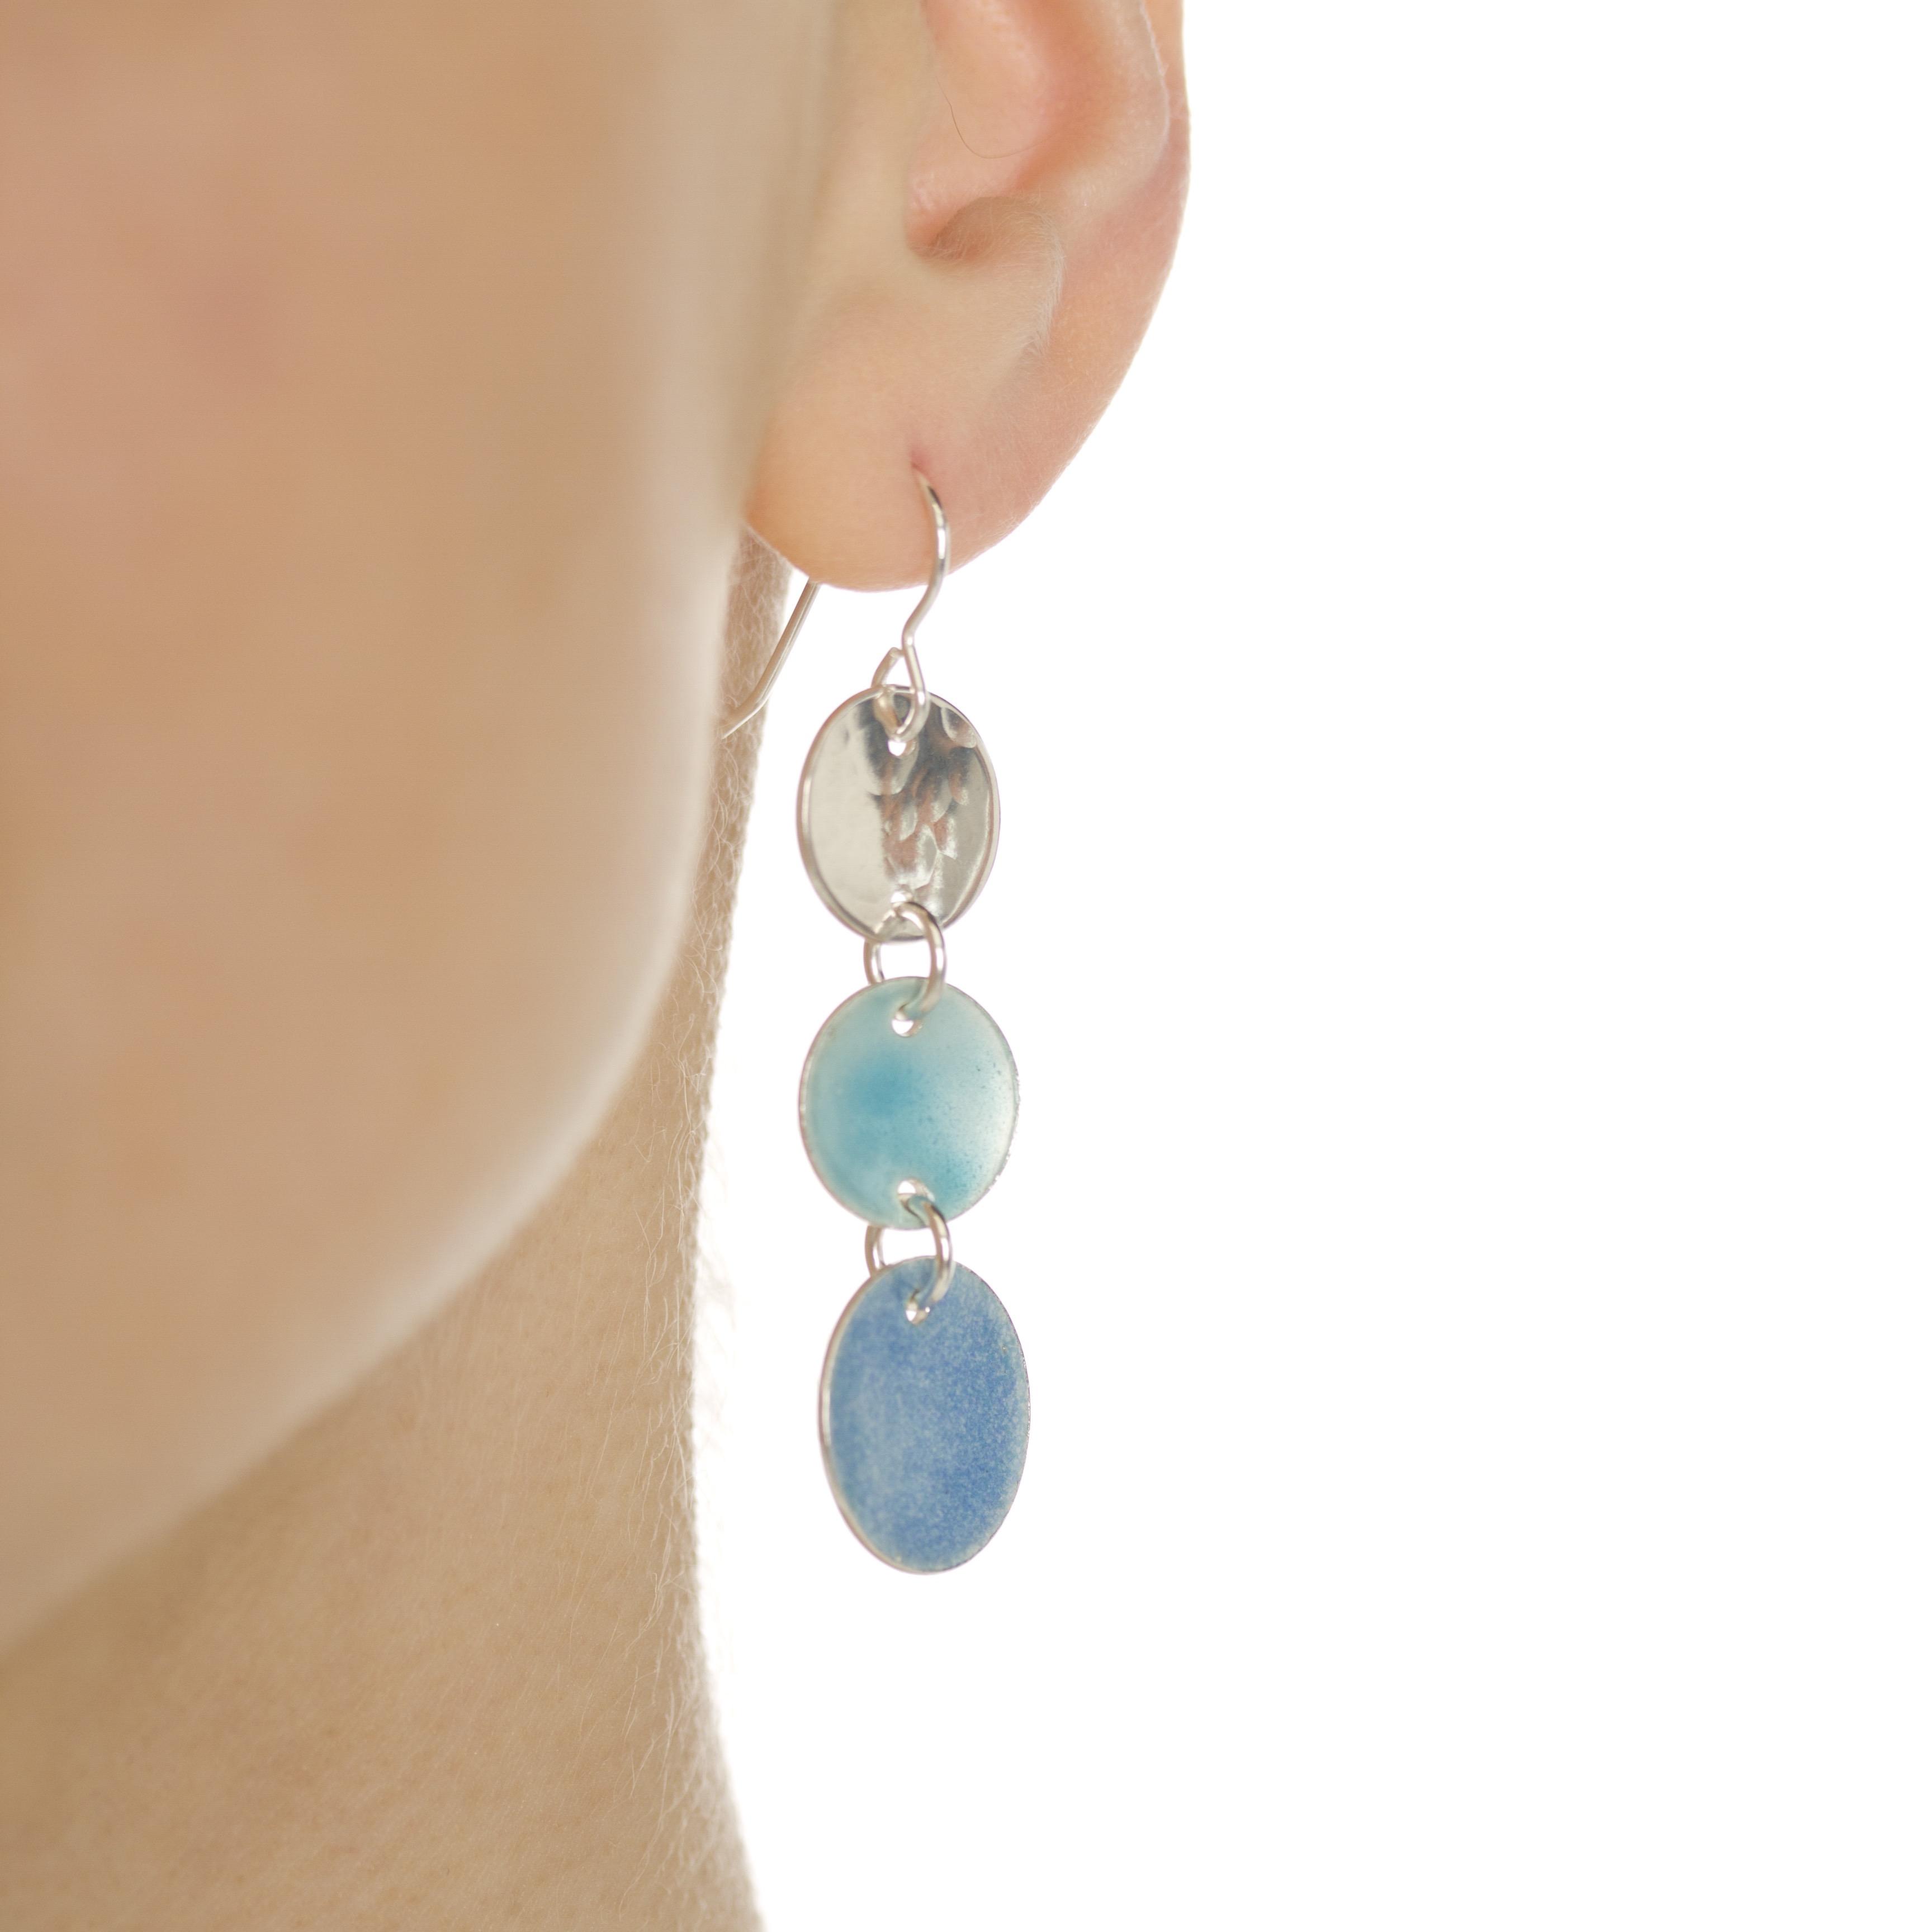 Handmade Langorran Enamelled Silver Earrings